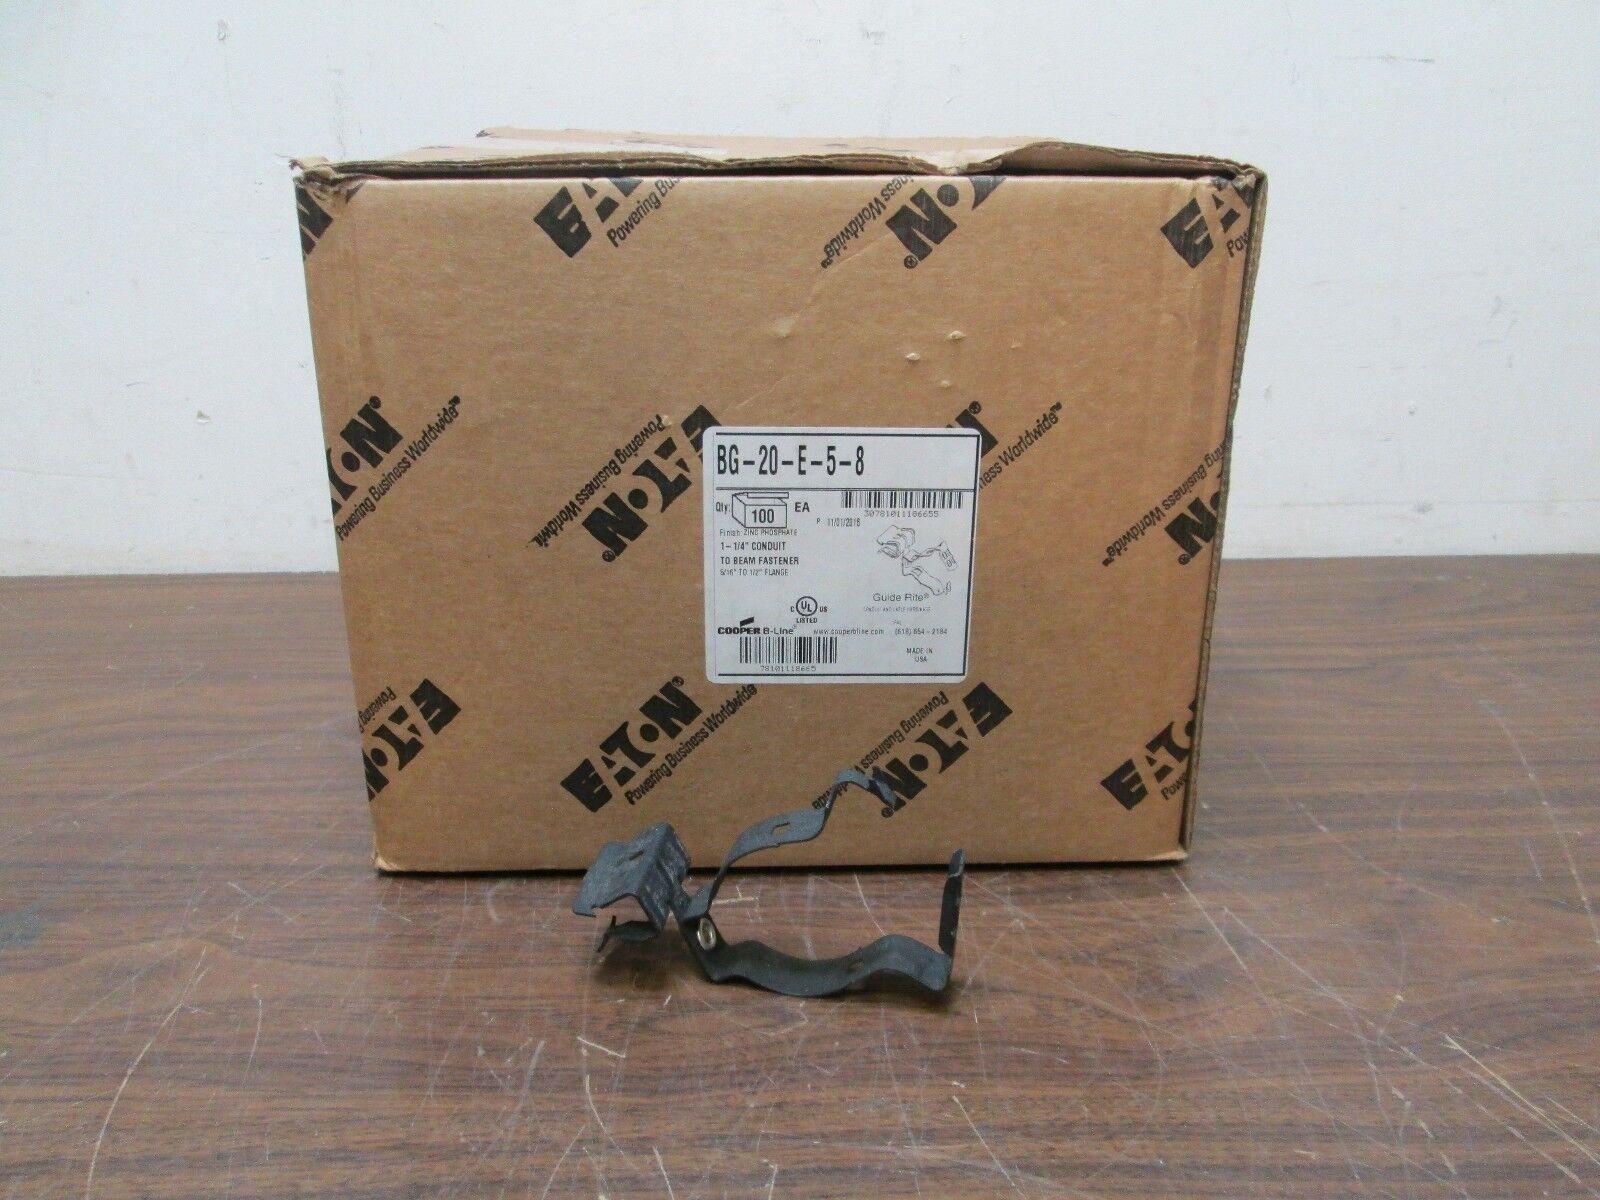 100Pc Cooper BG-20-E-5-8 1-1 4  Conduit to Beam Fastener 5 16  to 1 2  Flange